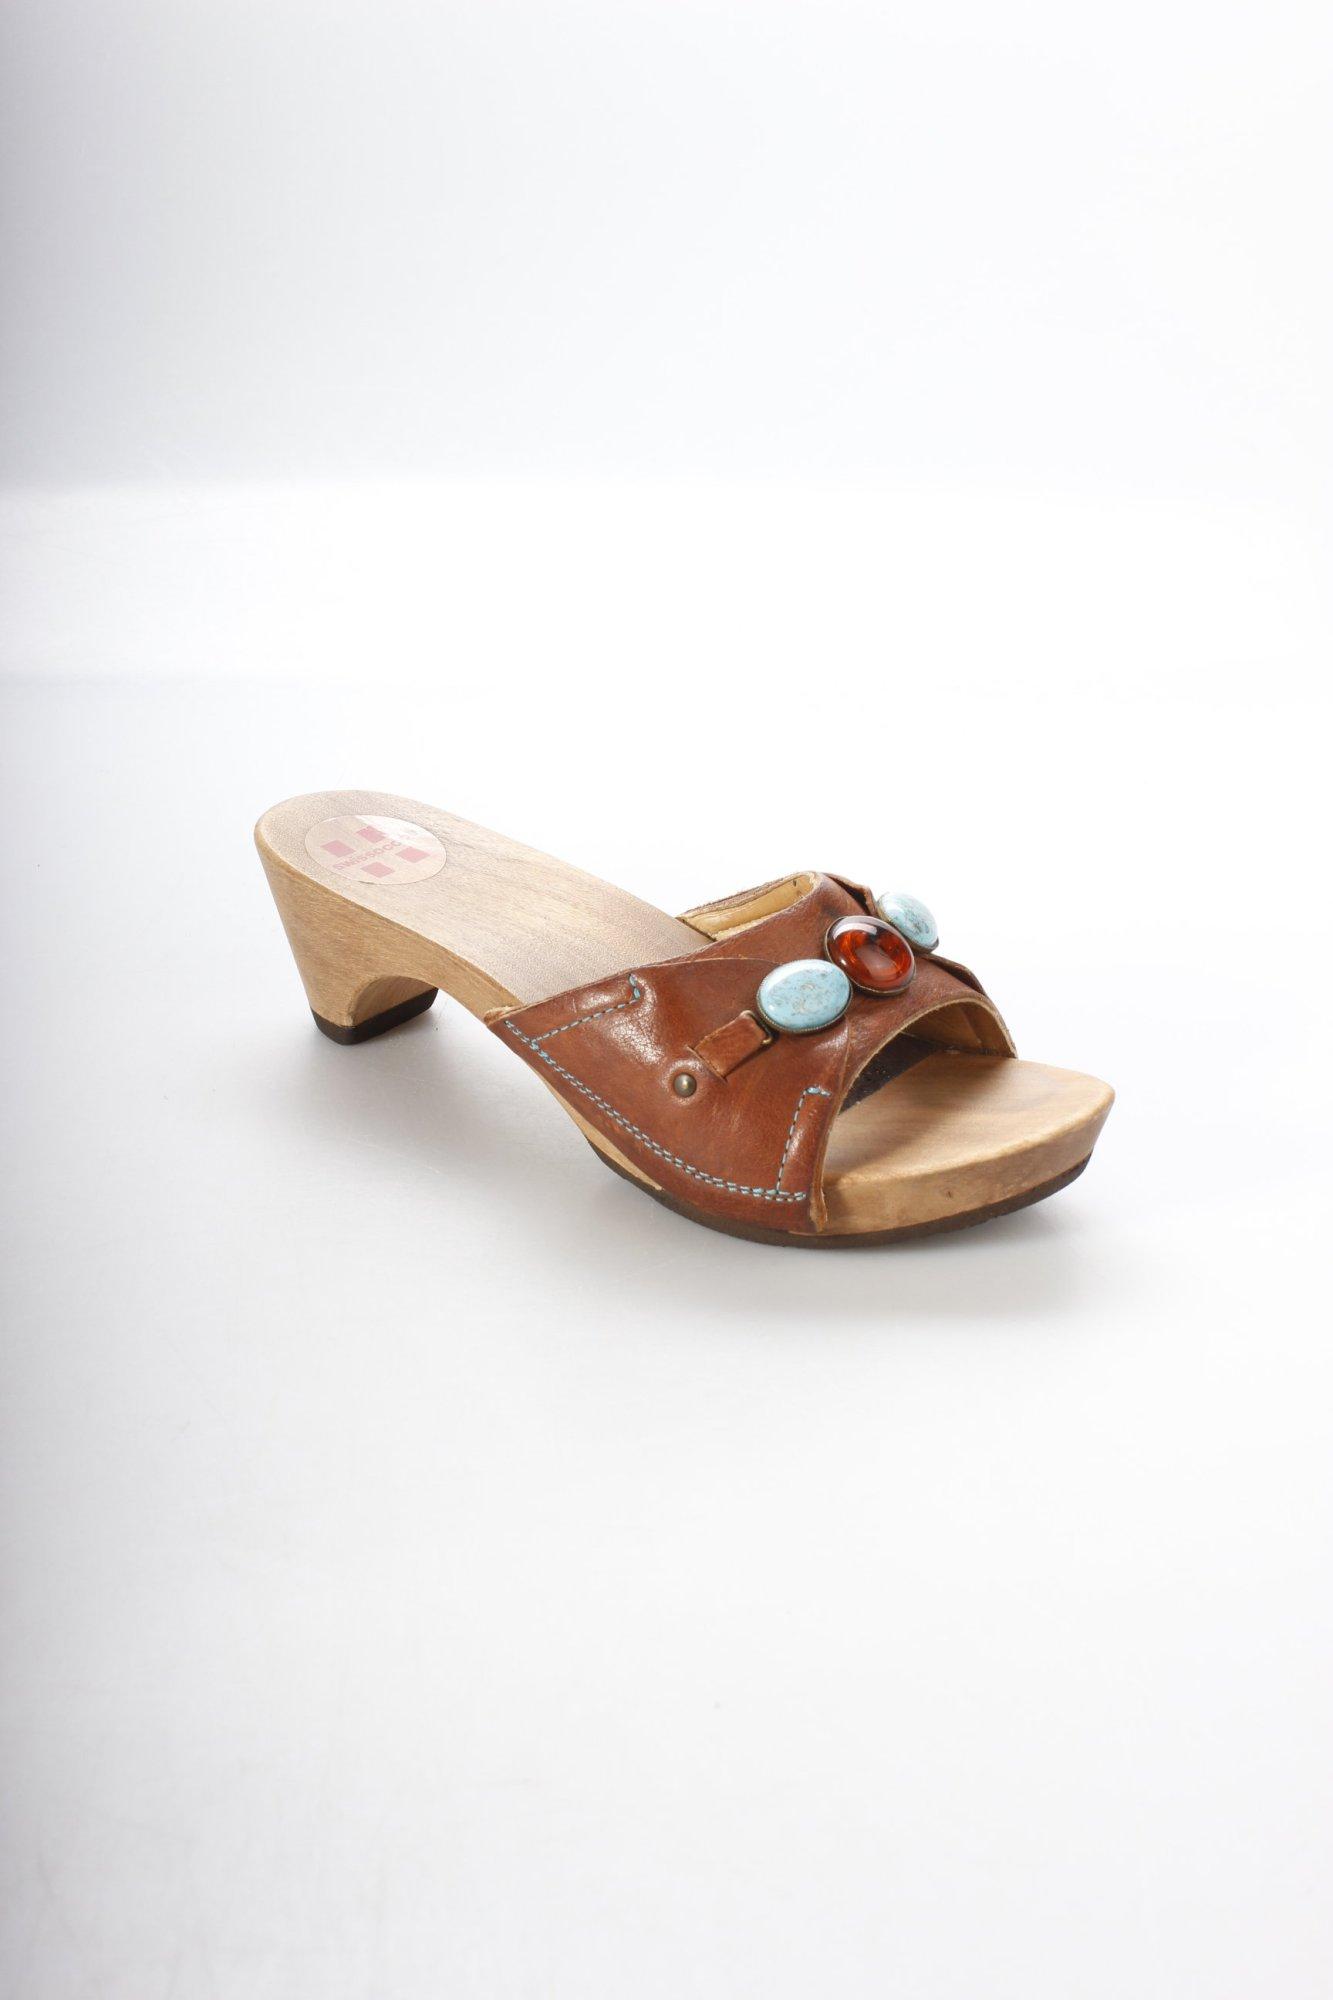 SWISSOCCOLI-Clog-Sandalen-mehrfarbig-Boho-Look-Damen-Gr-DE-37-braun-Sandals